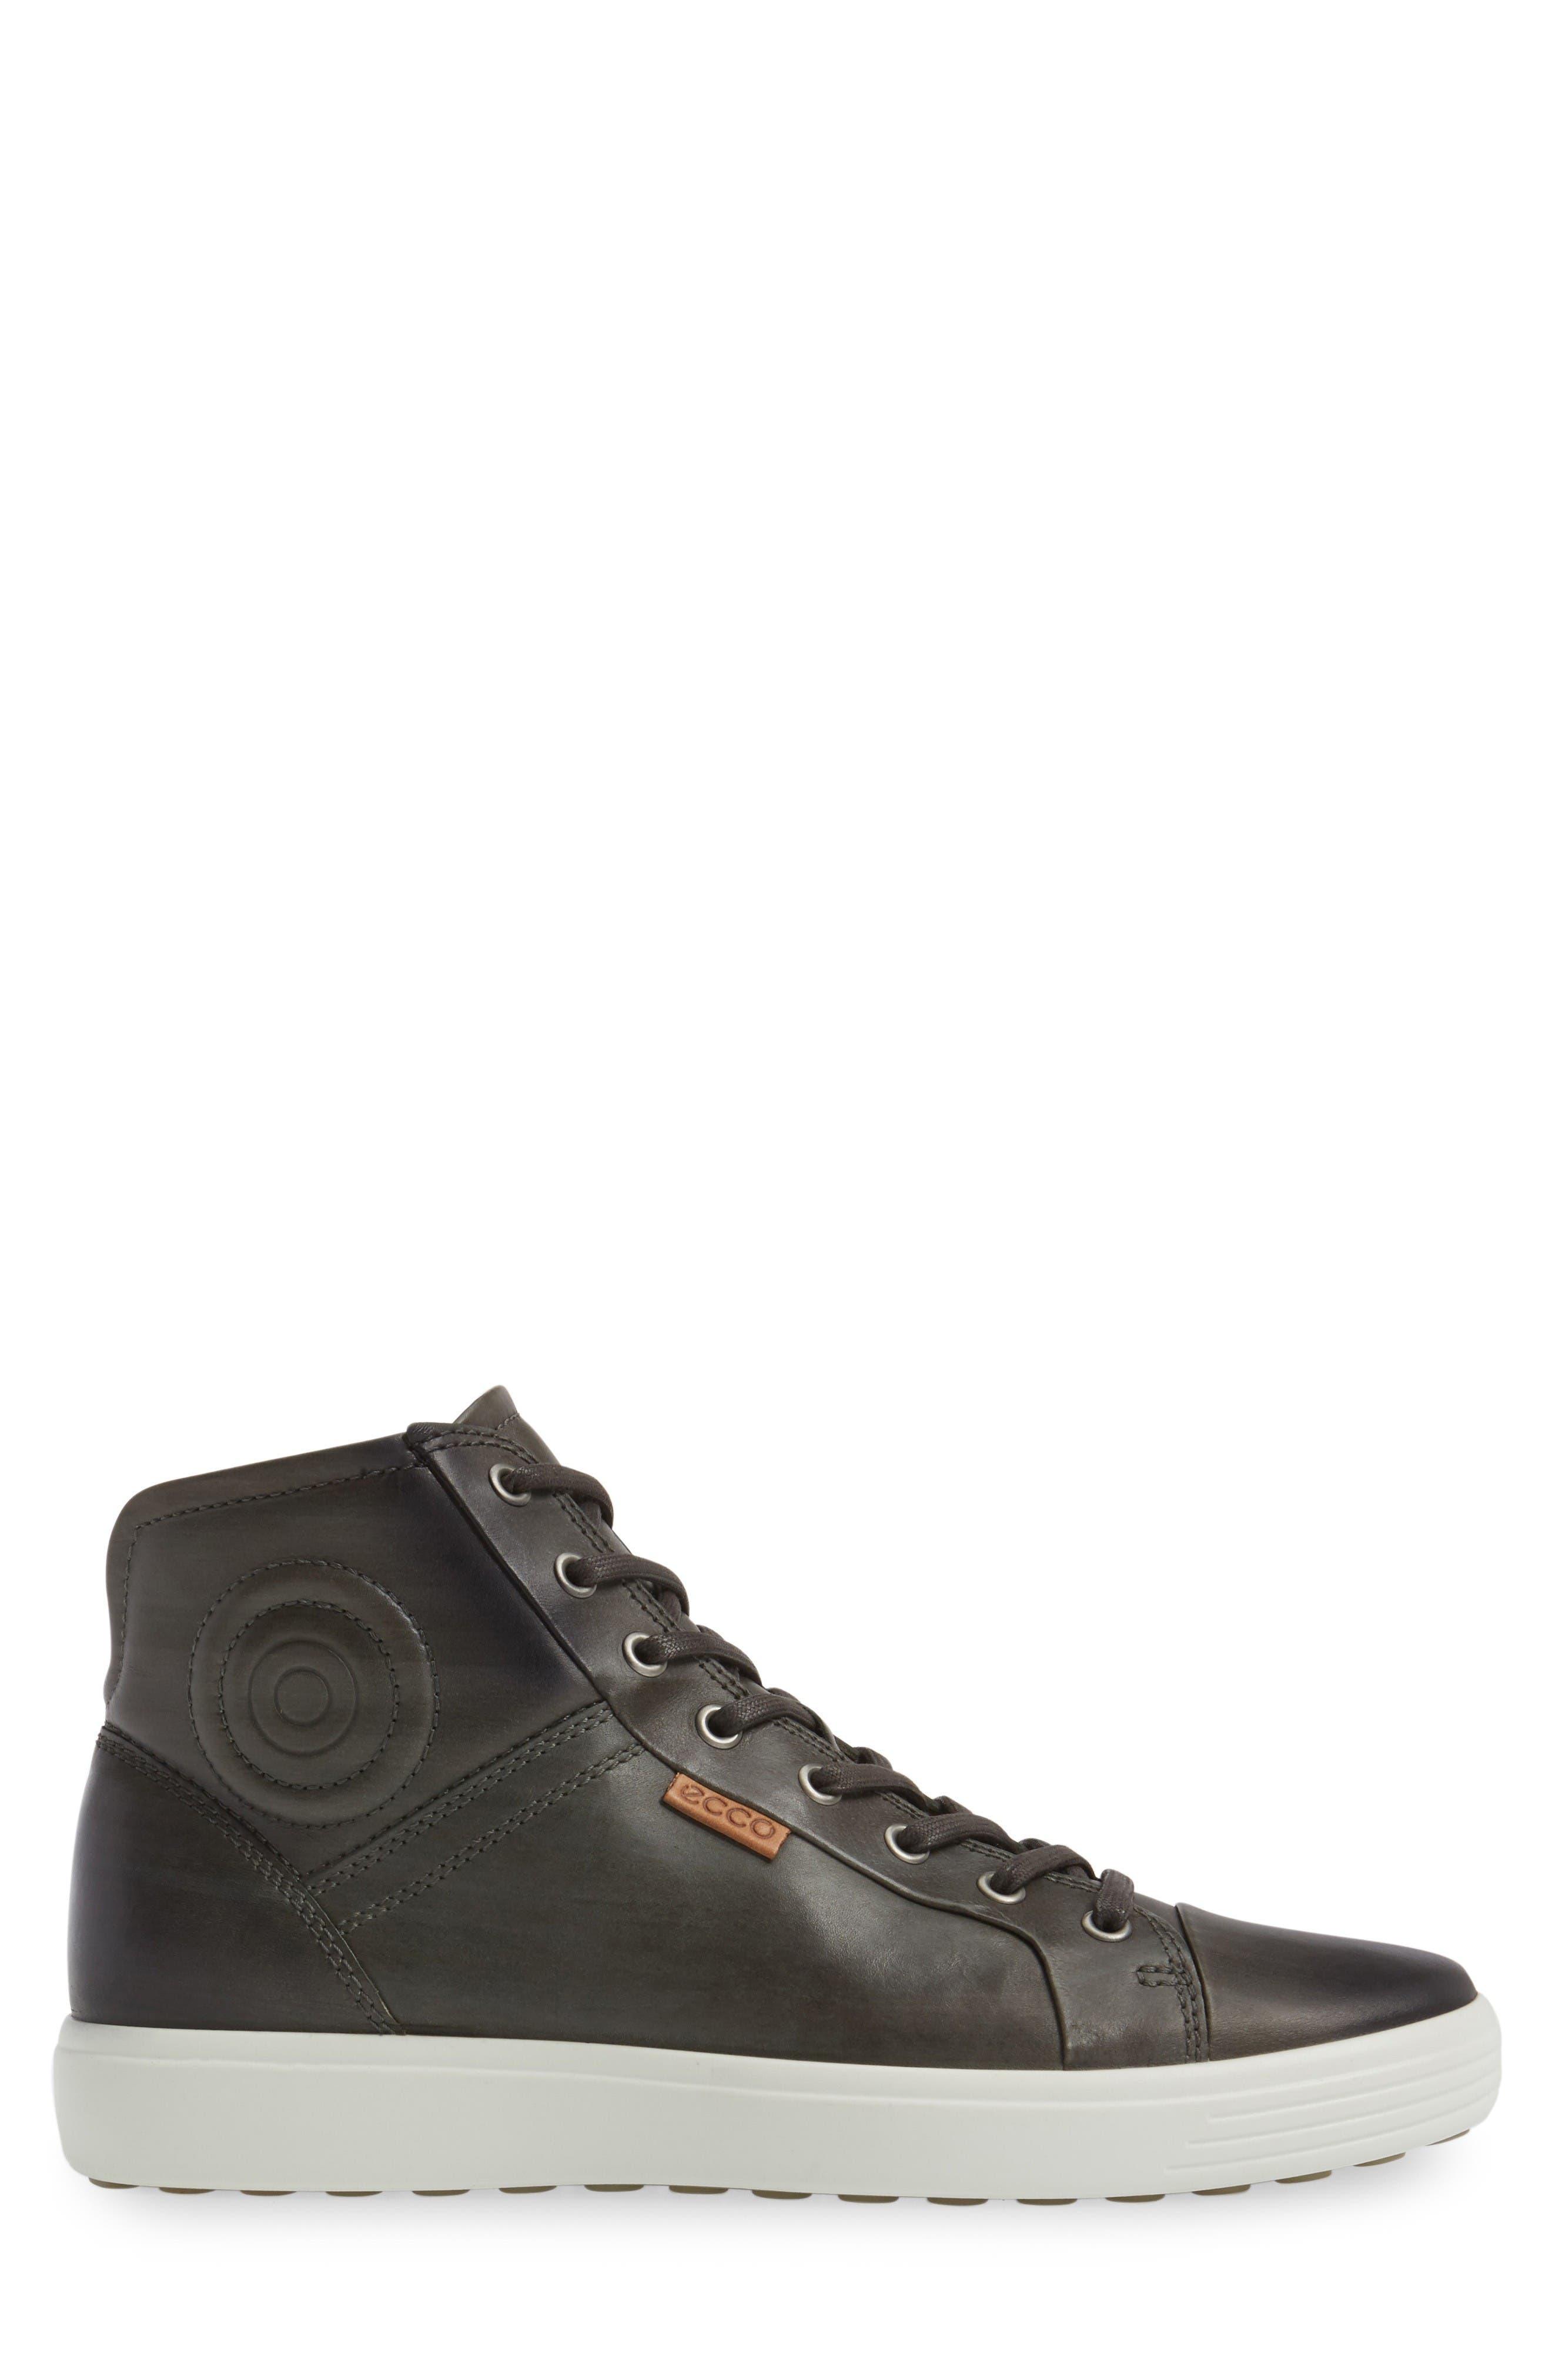 Alternate Image 3  - ECCO Soft 7 High Top Sneaker (Men)